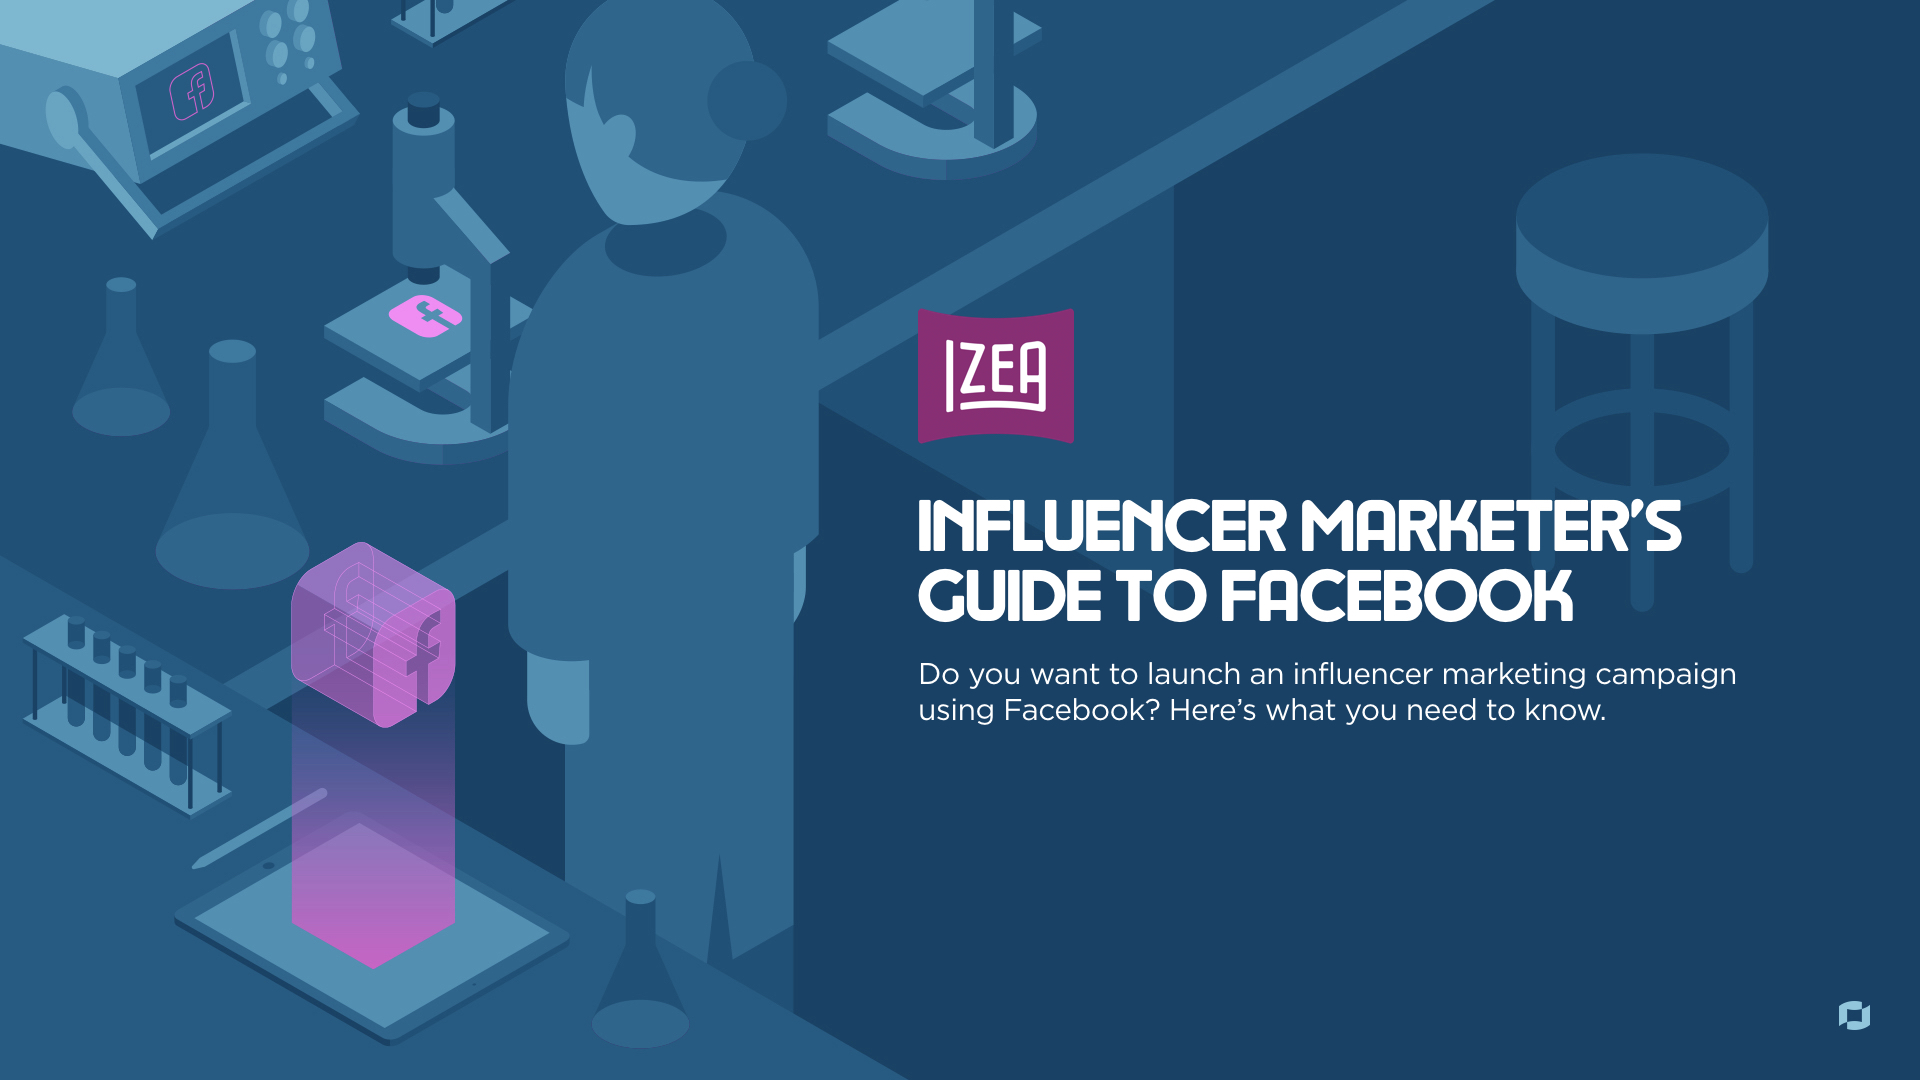 Guide to Facebook Influencer Marketing